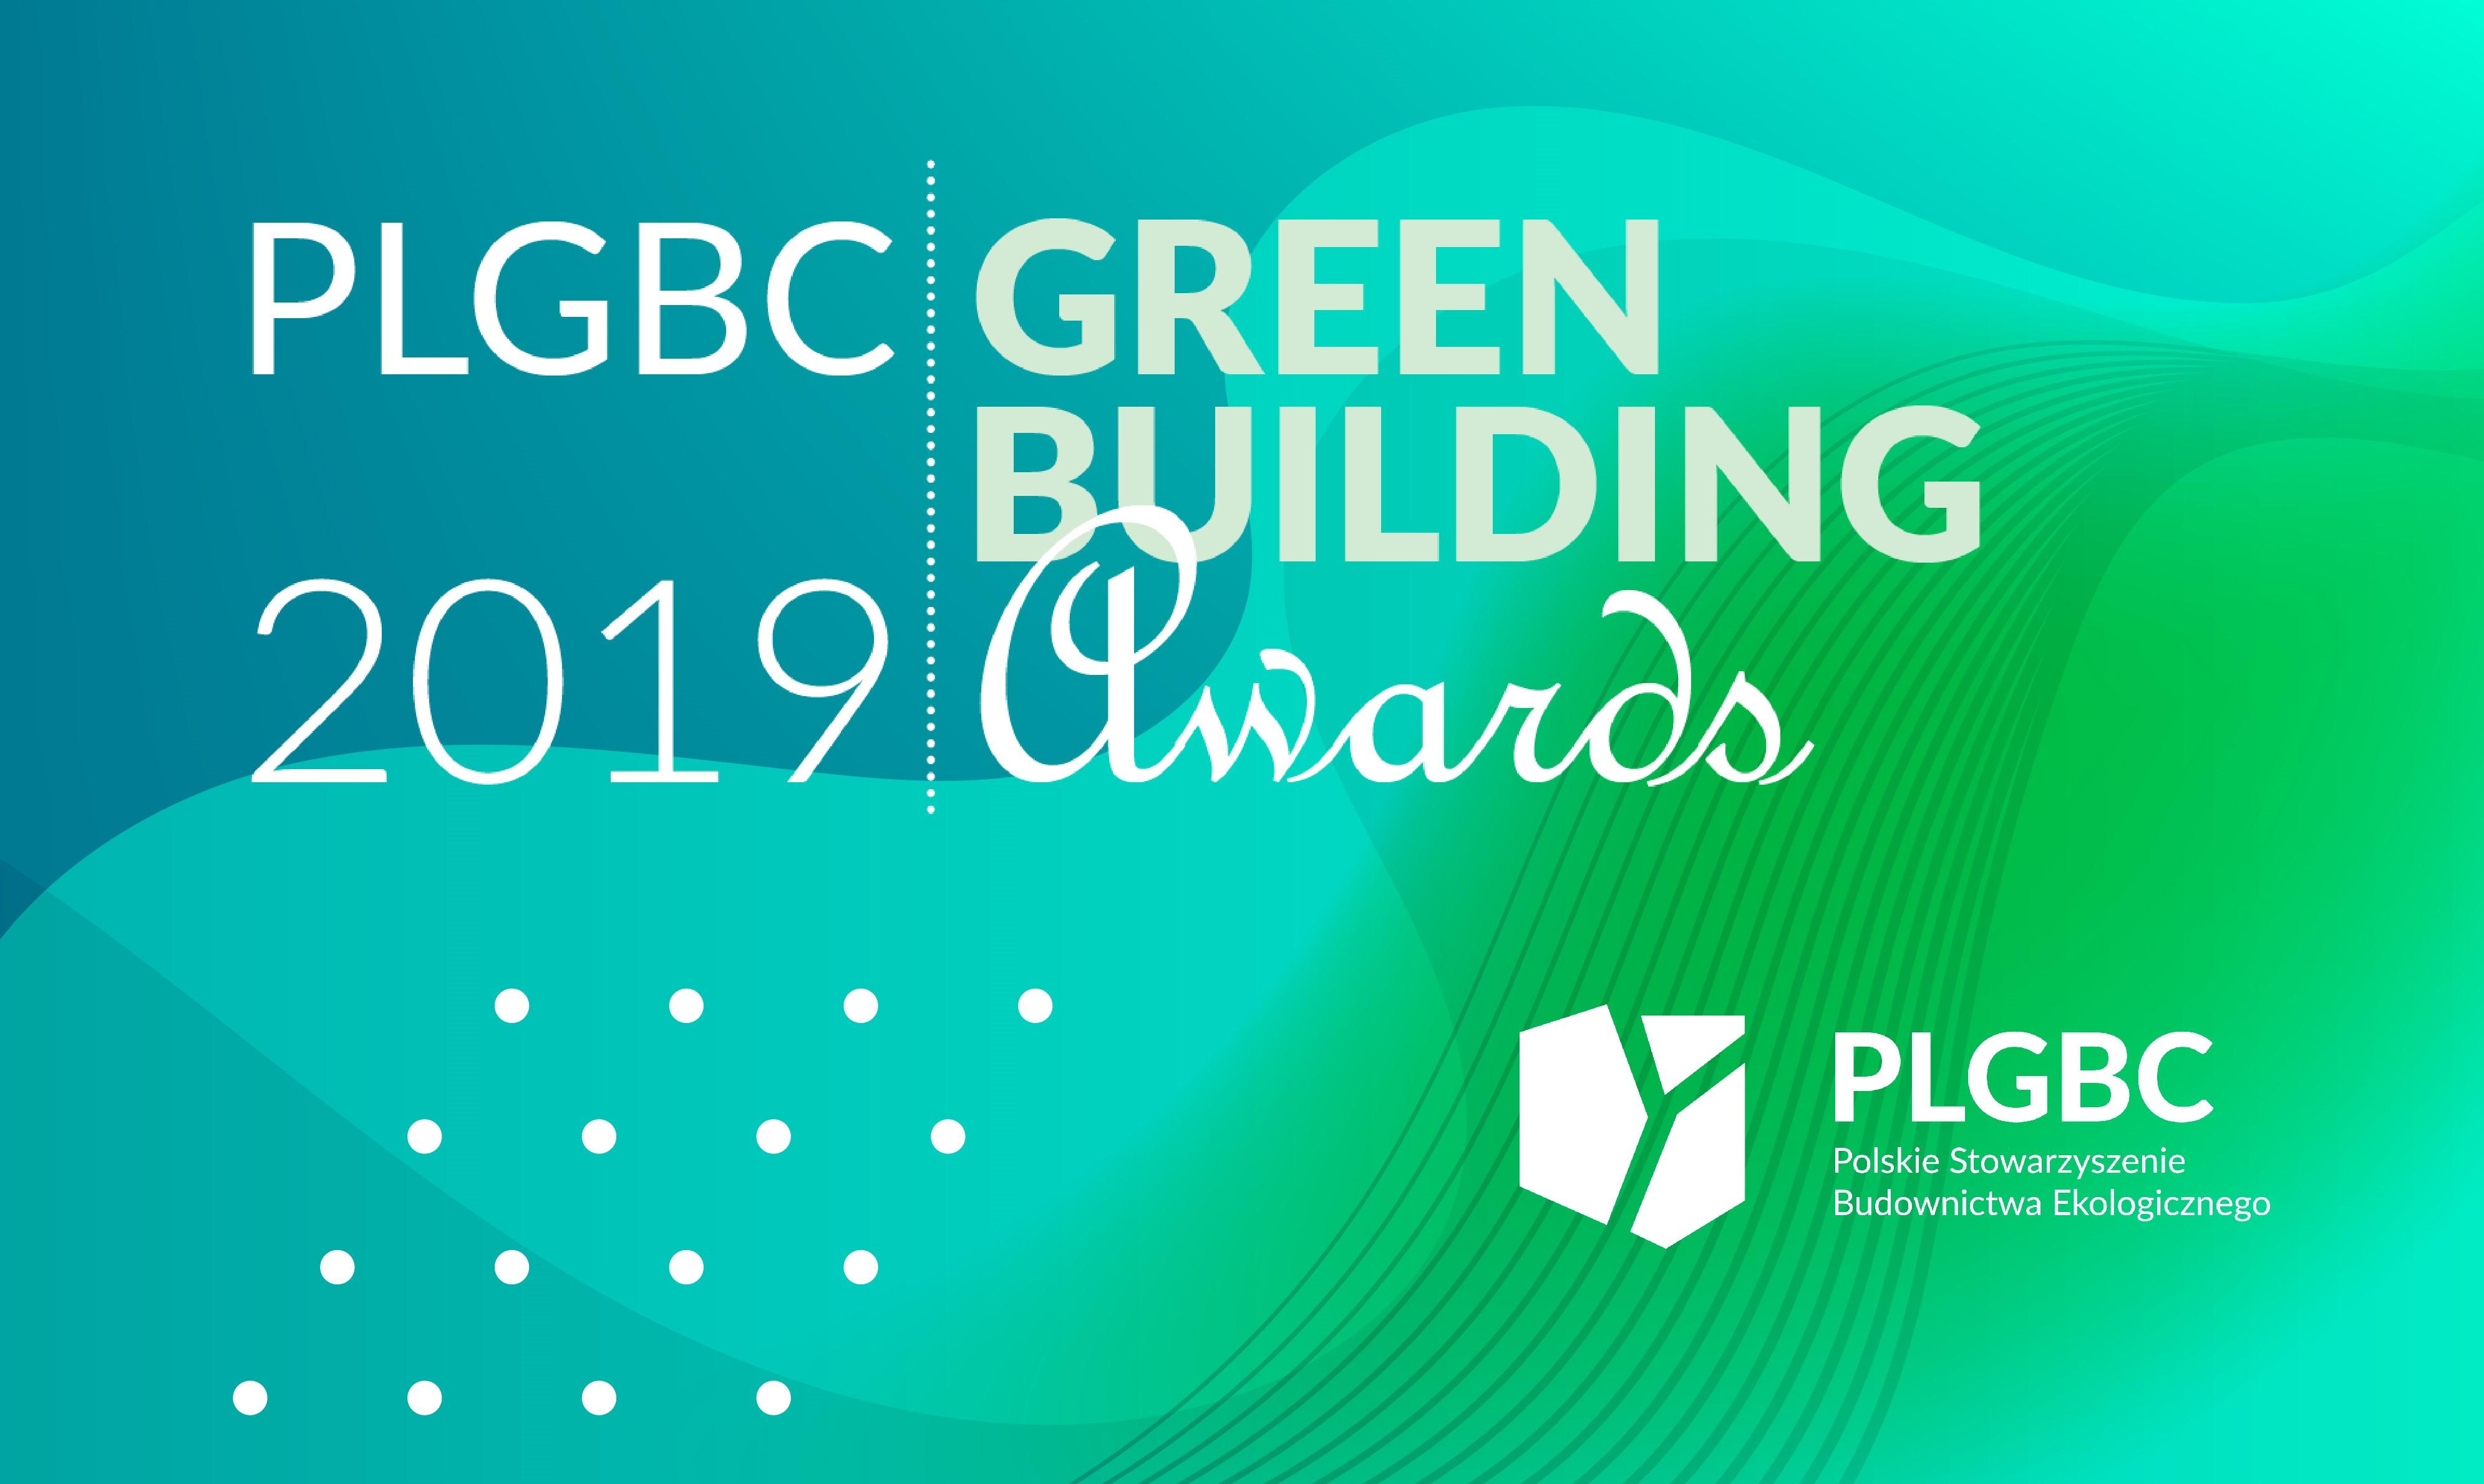 PLGBC GREEN BUILDING AWARDS 2019